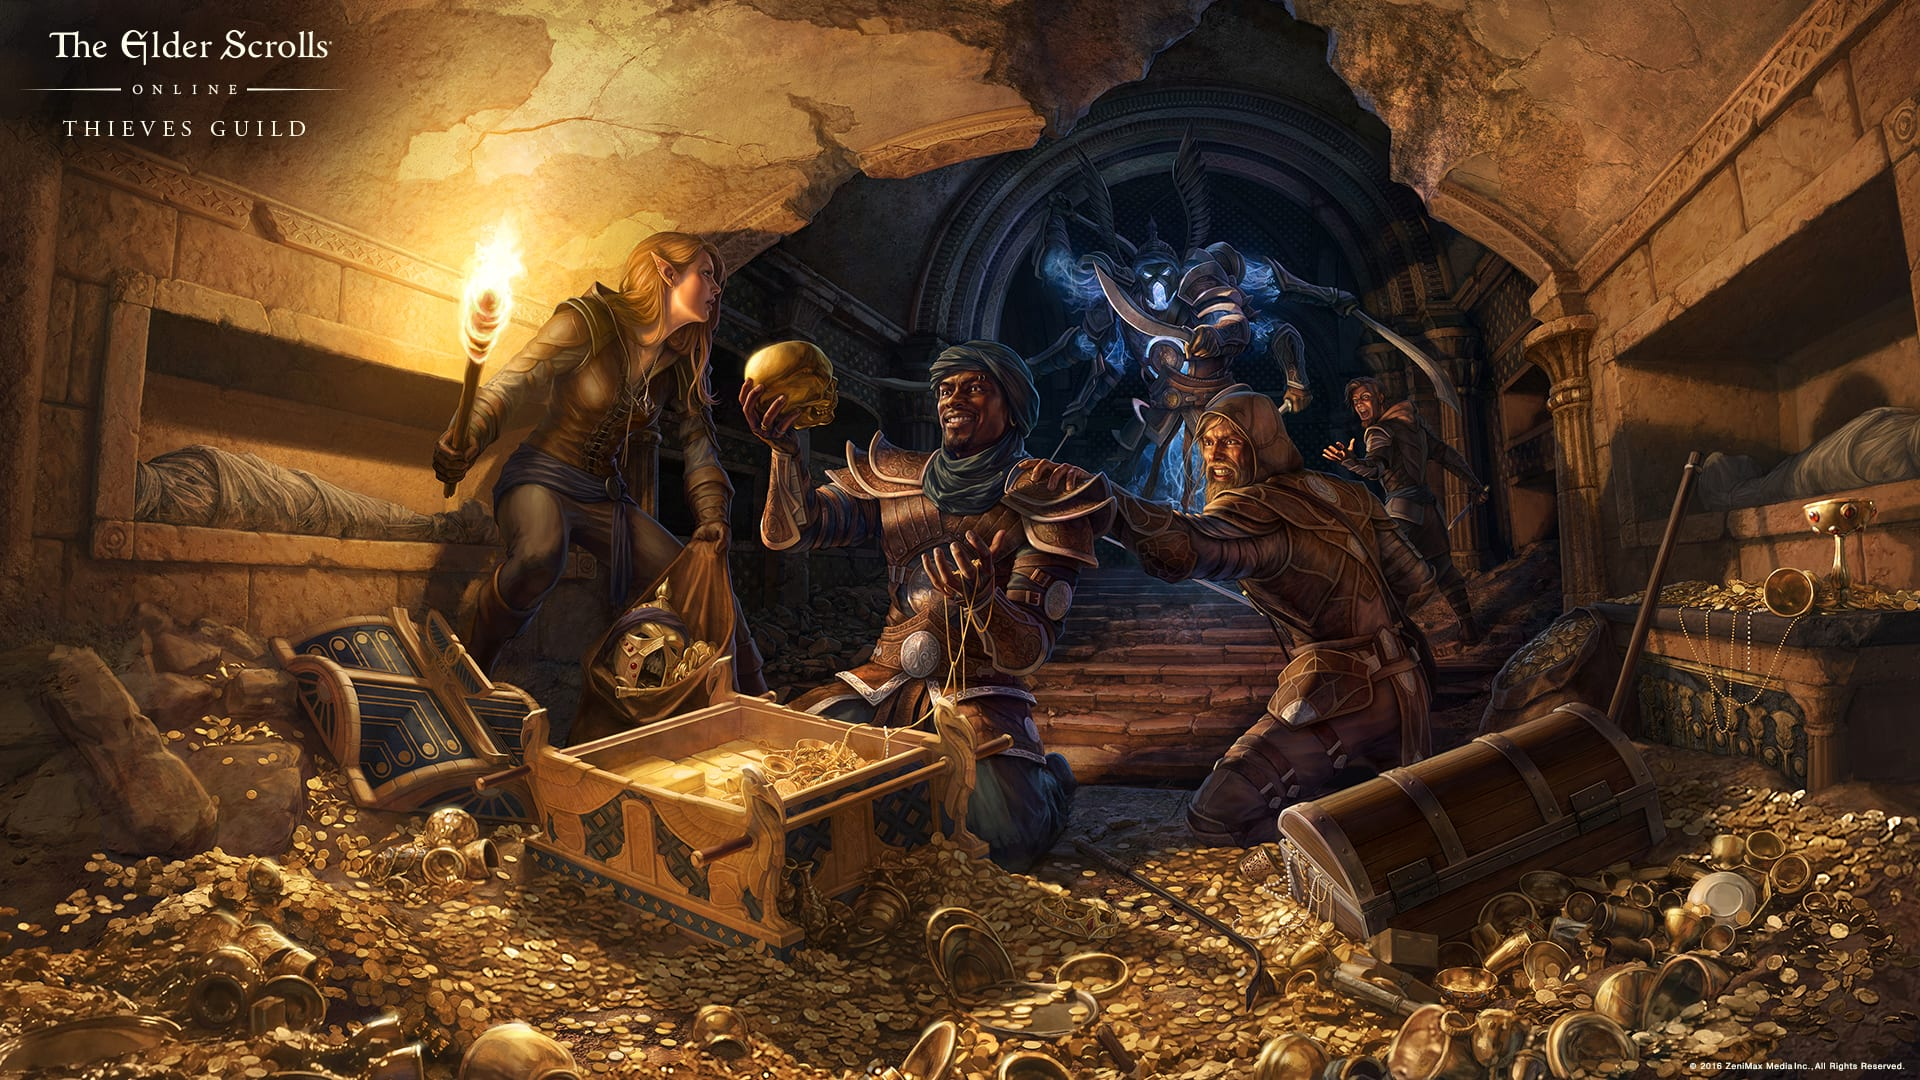 Nocturnal Skyrim Wallpaper